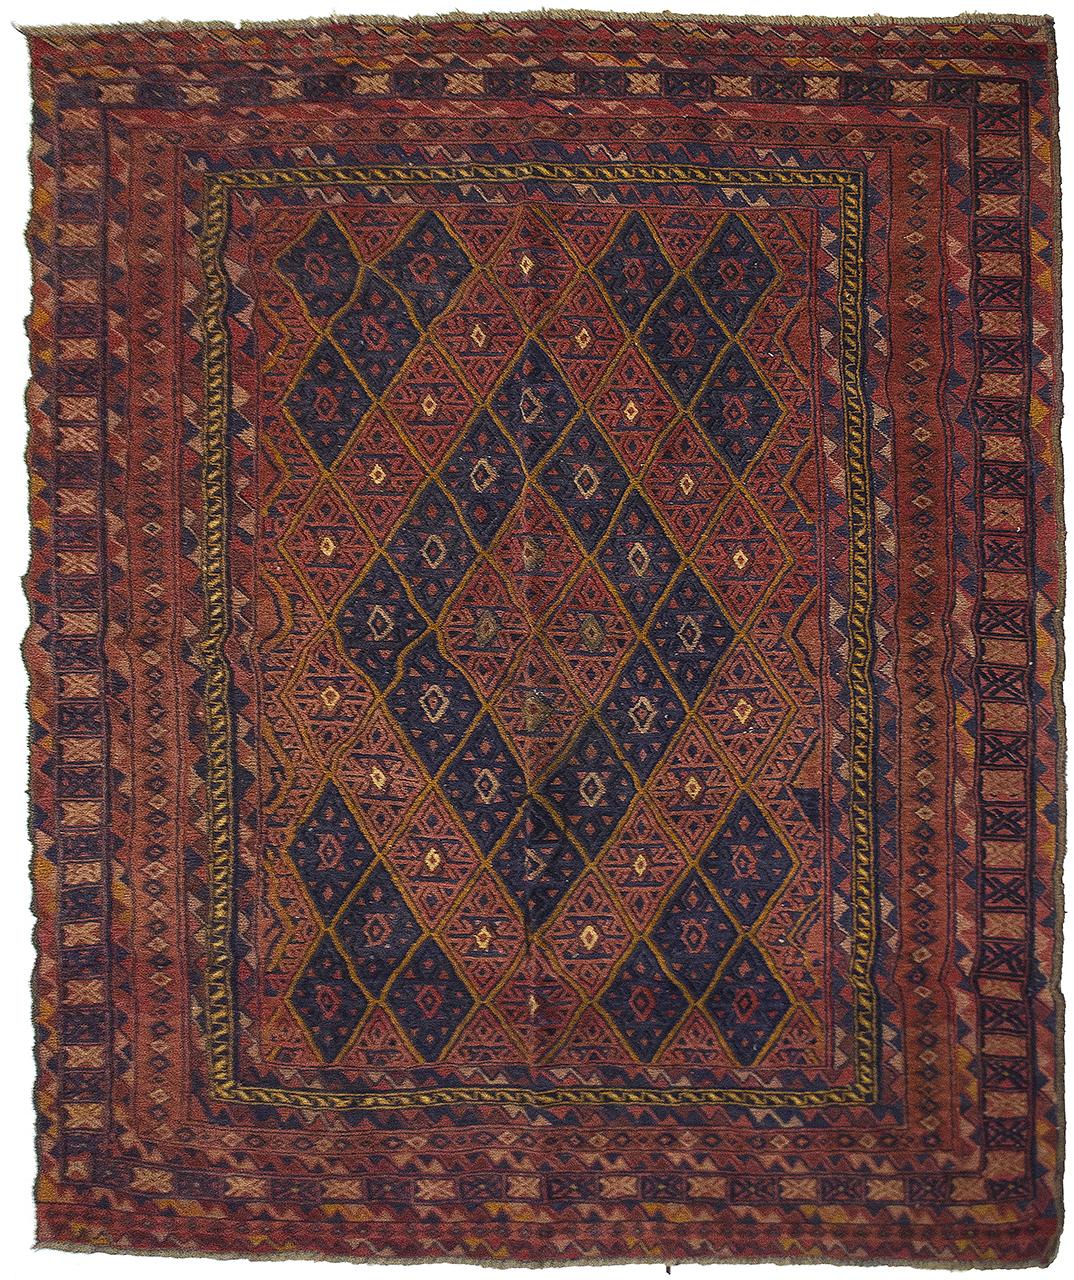 Photo Matt Camron Rugs Images Mahal Antique Persian Rug